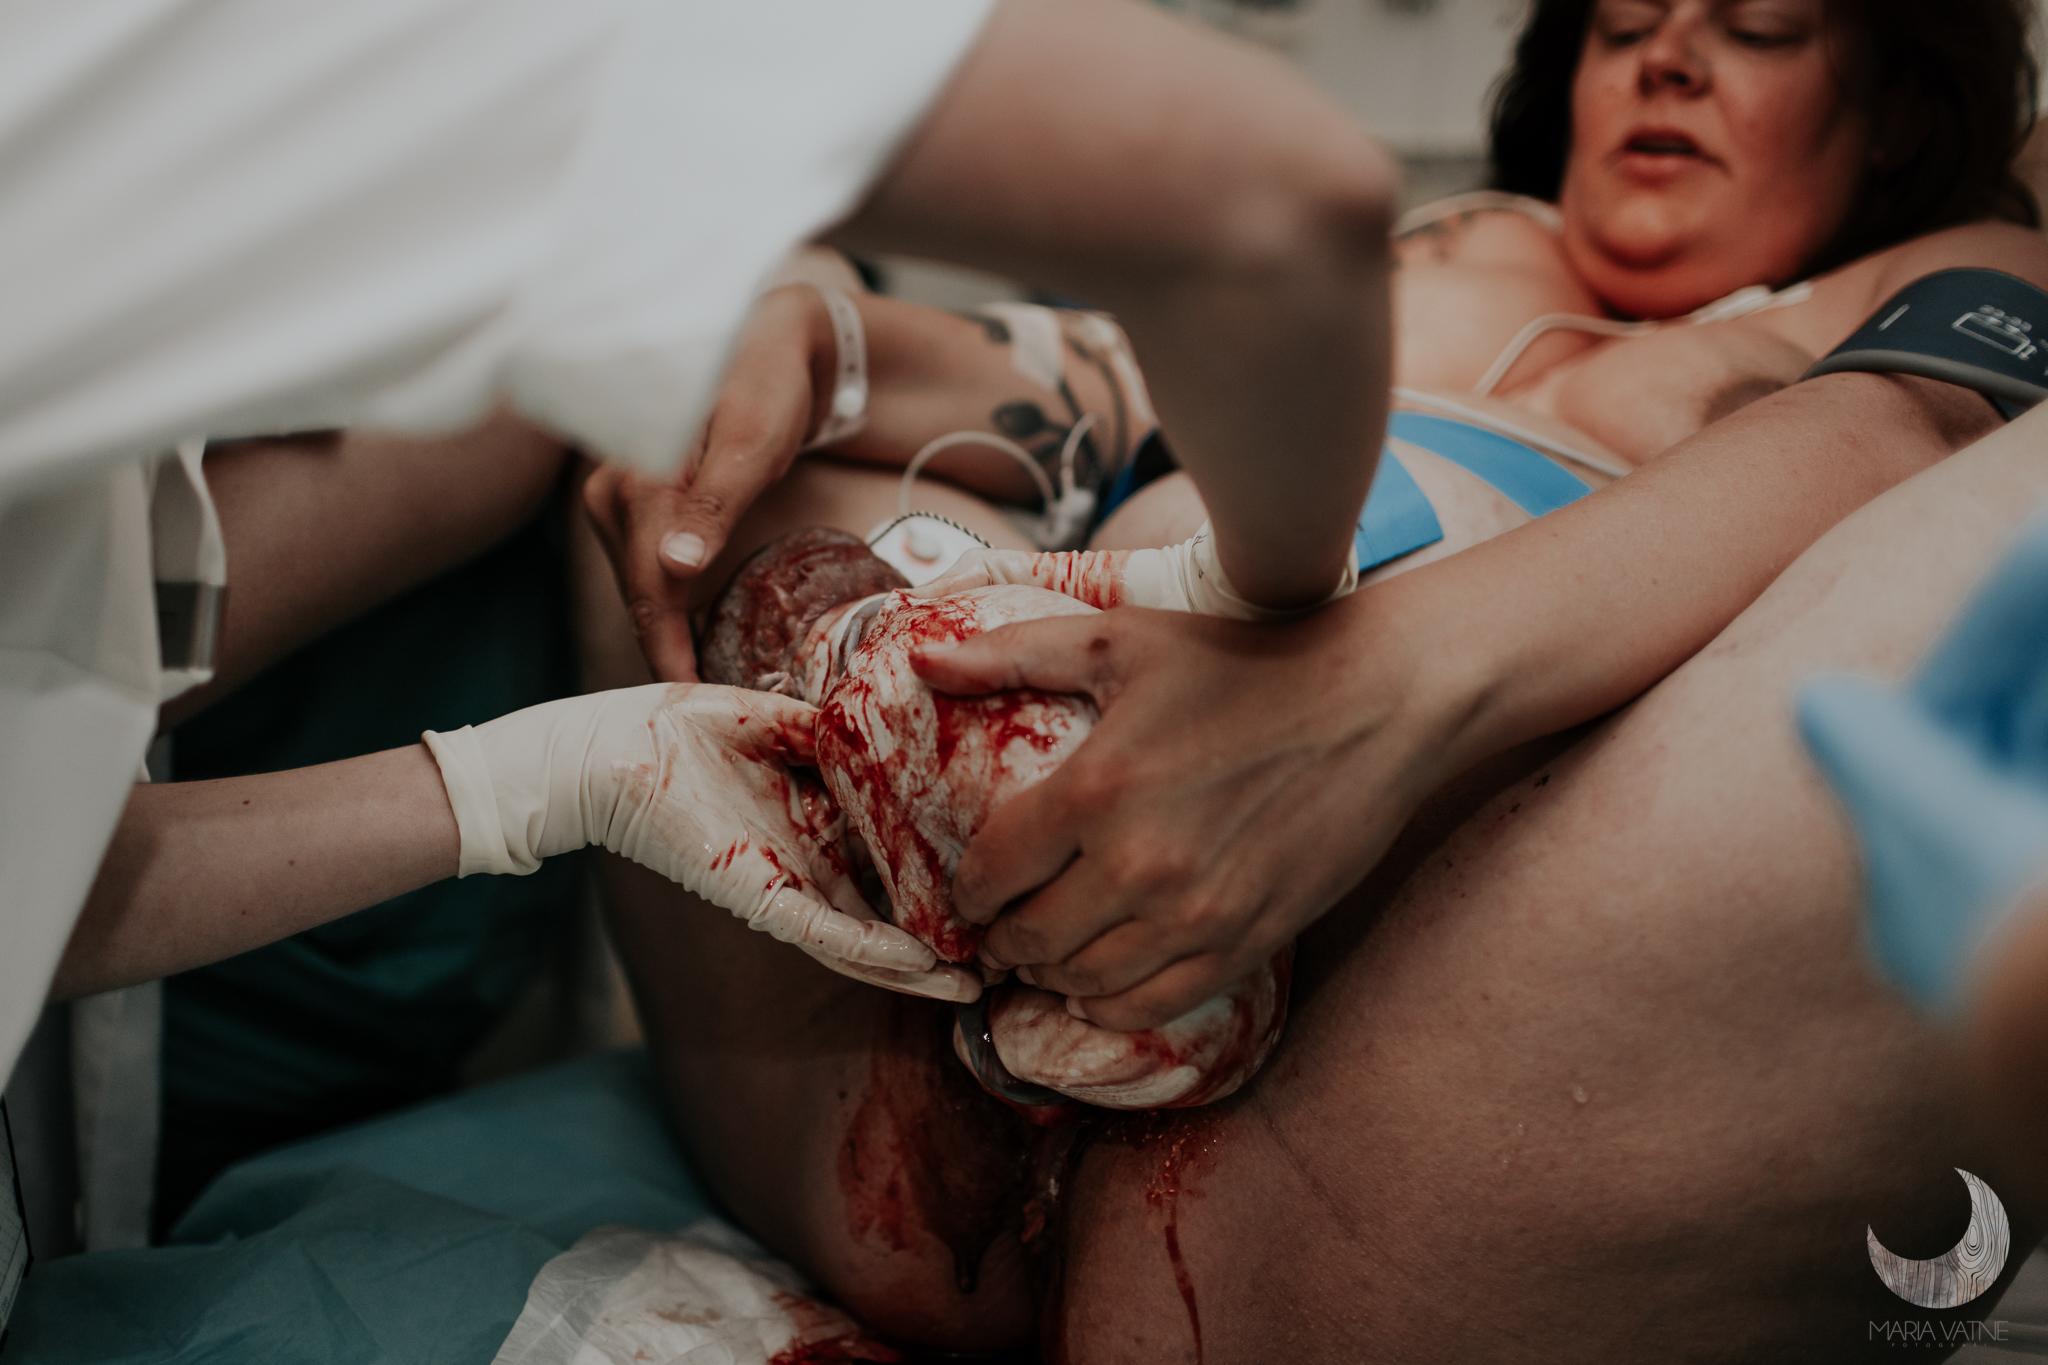 fotograf-fødselsfotograf-kongsberg-oslo-drammen-maria-vatne-nyfødtfotografering-115.jpg